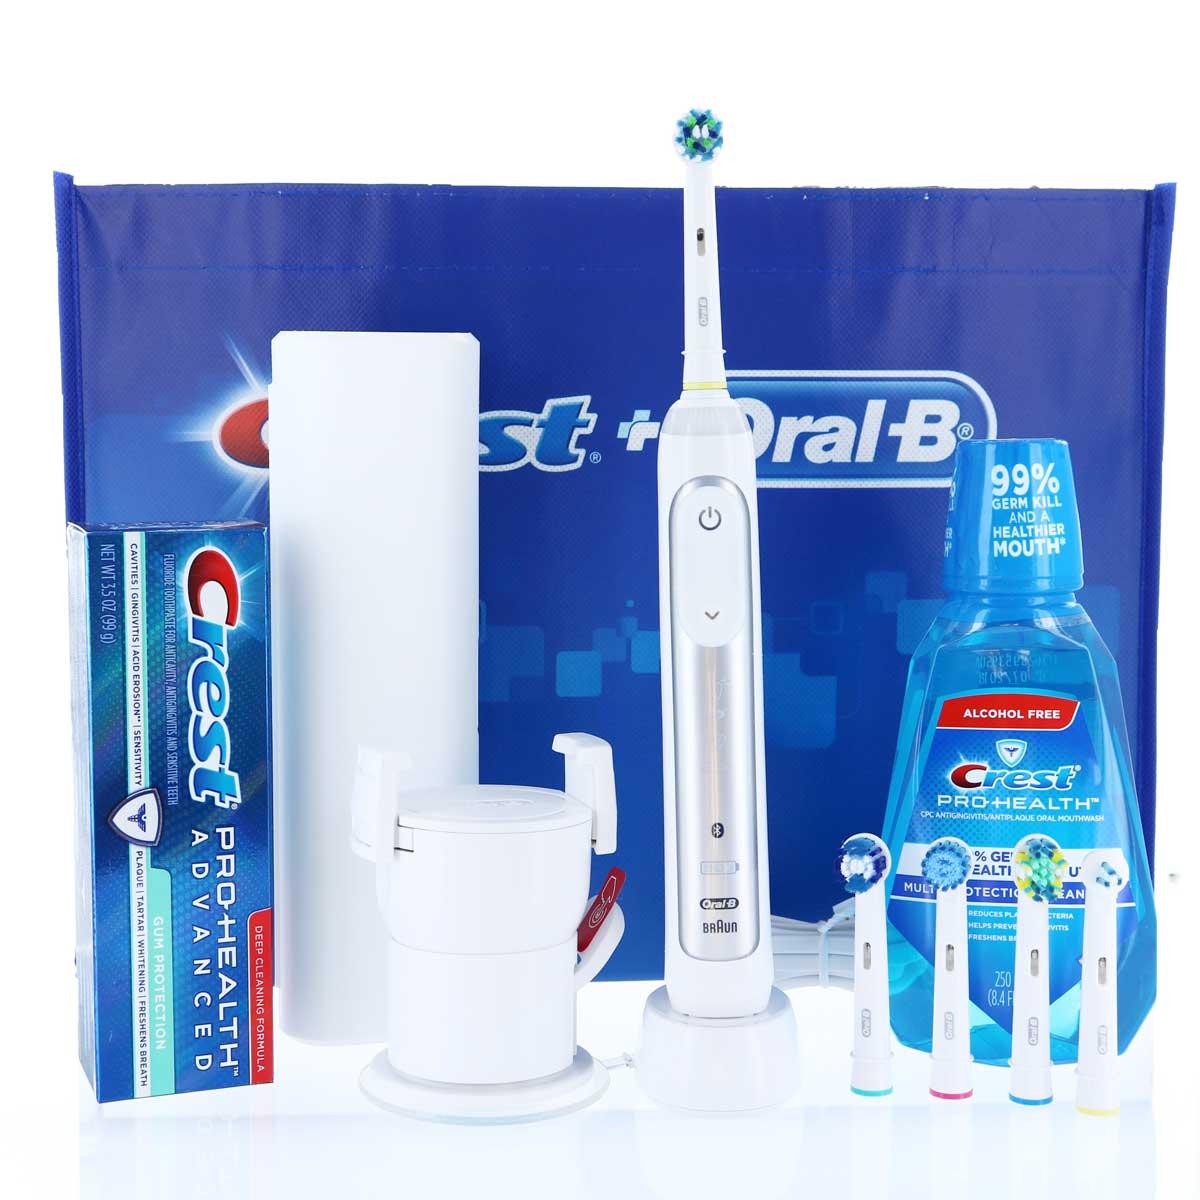 Oral-B GENIUS 6000 Power Toothbrush with Bluetooth Kit